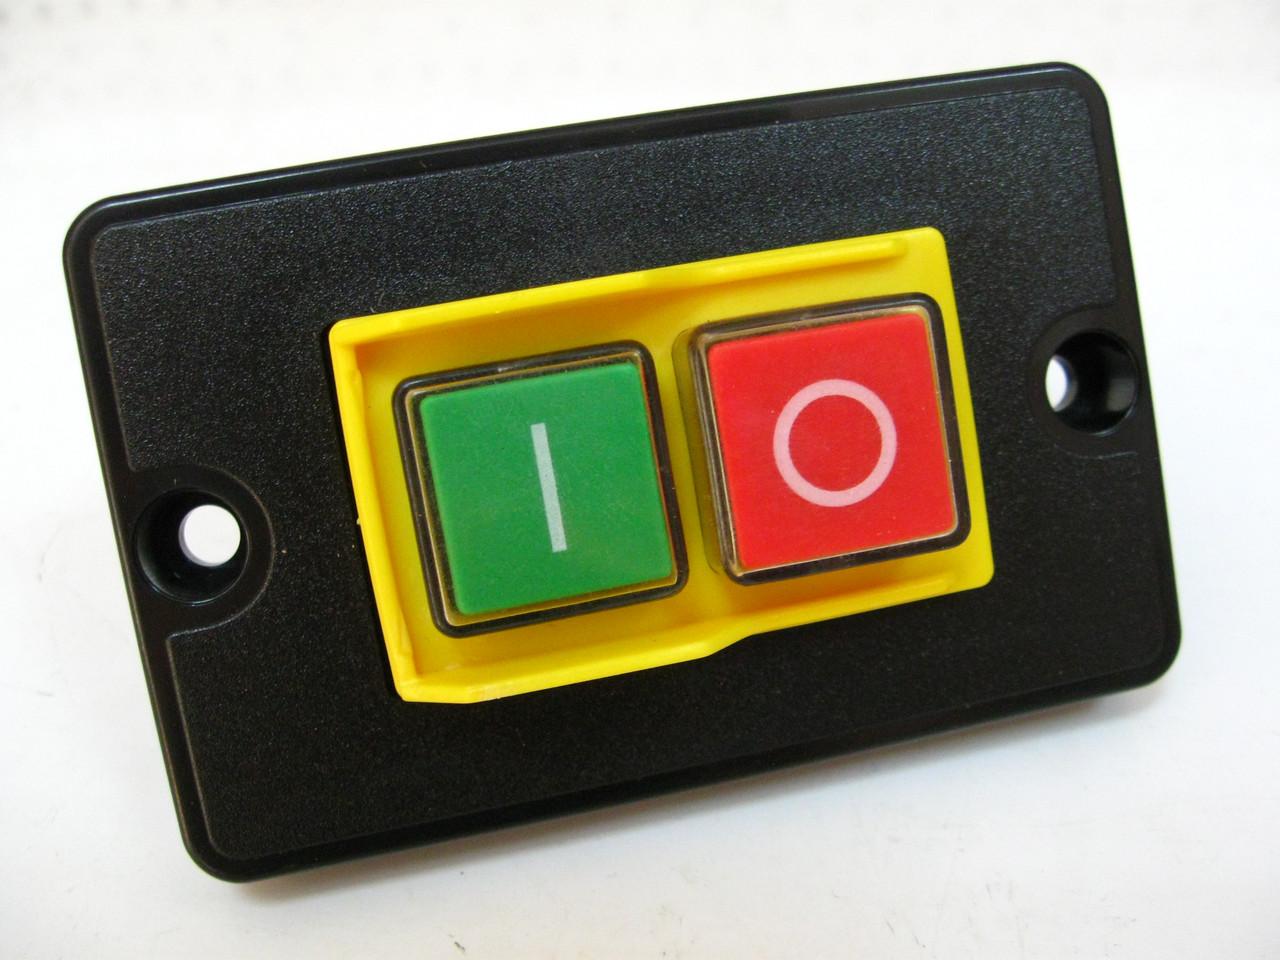 Кнопка бетономешалки Кентавр 4 контакта, 6А